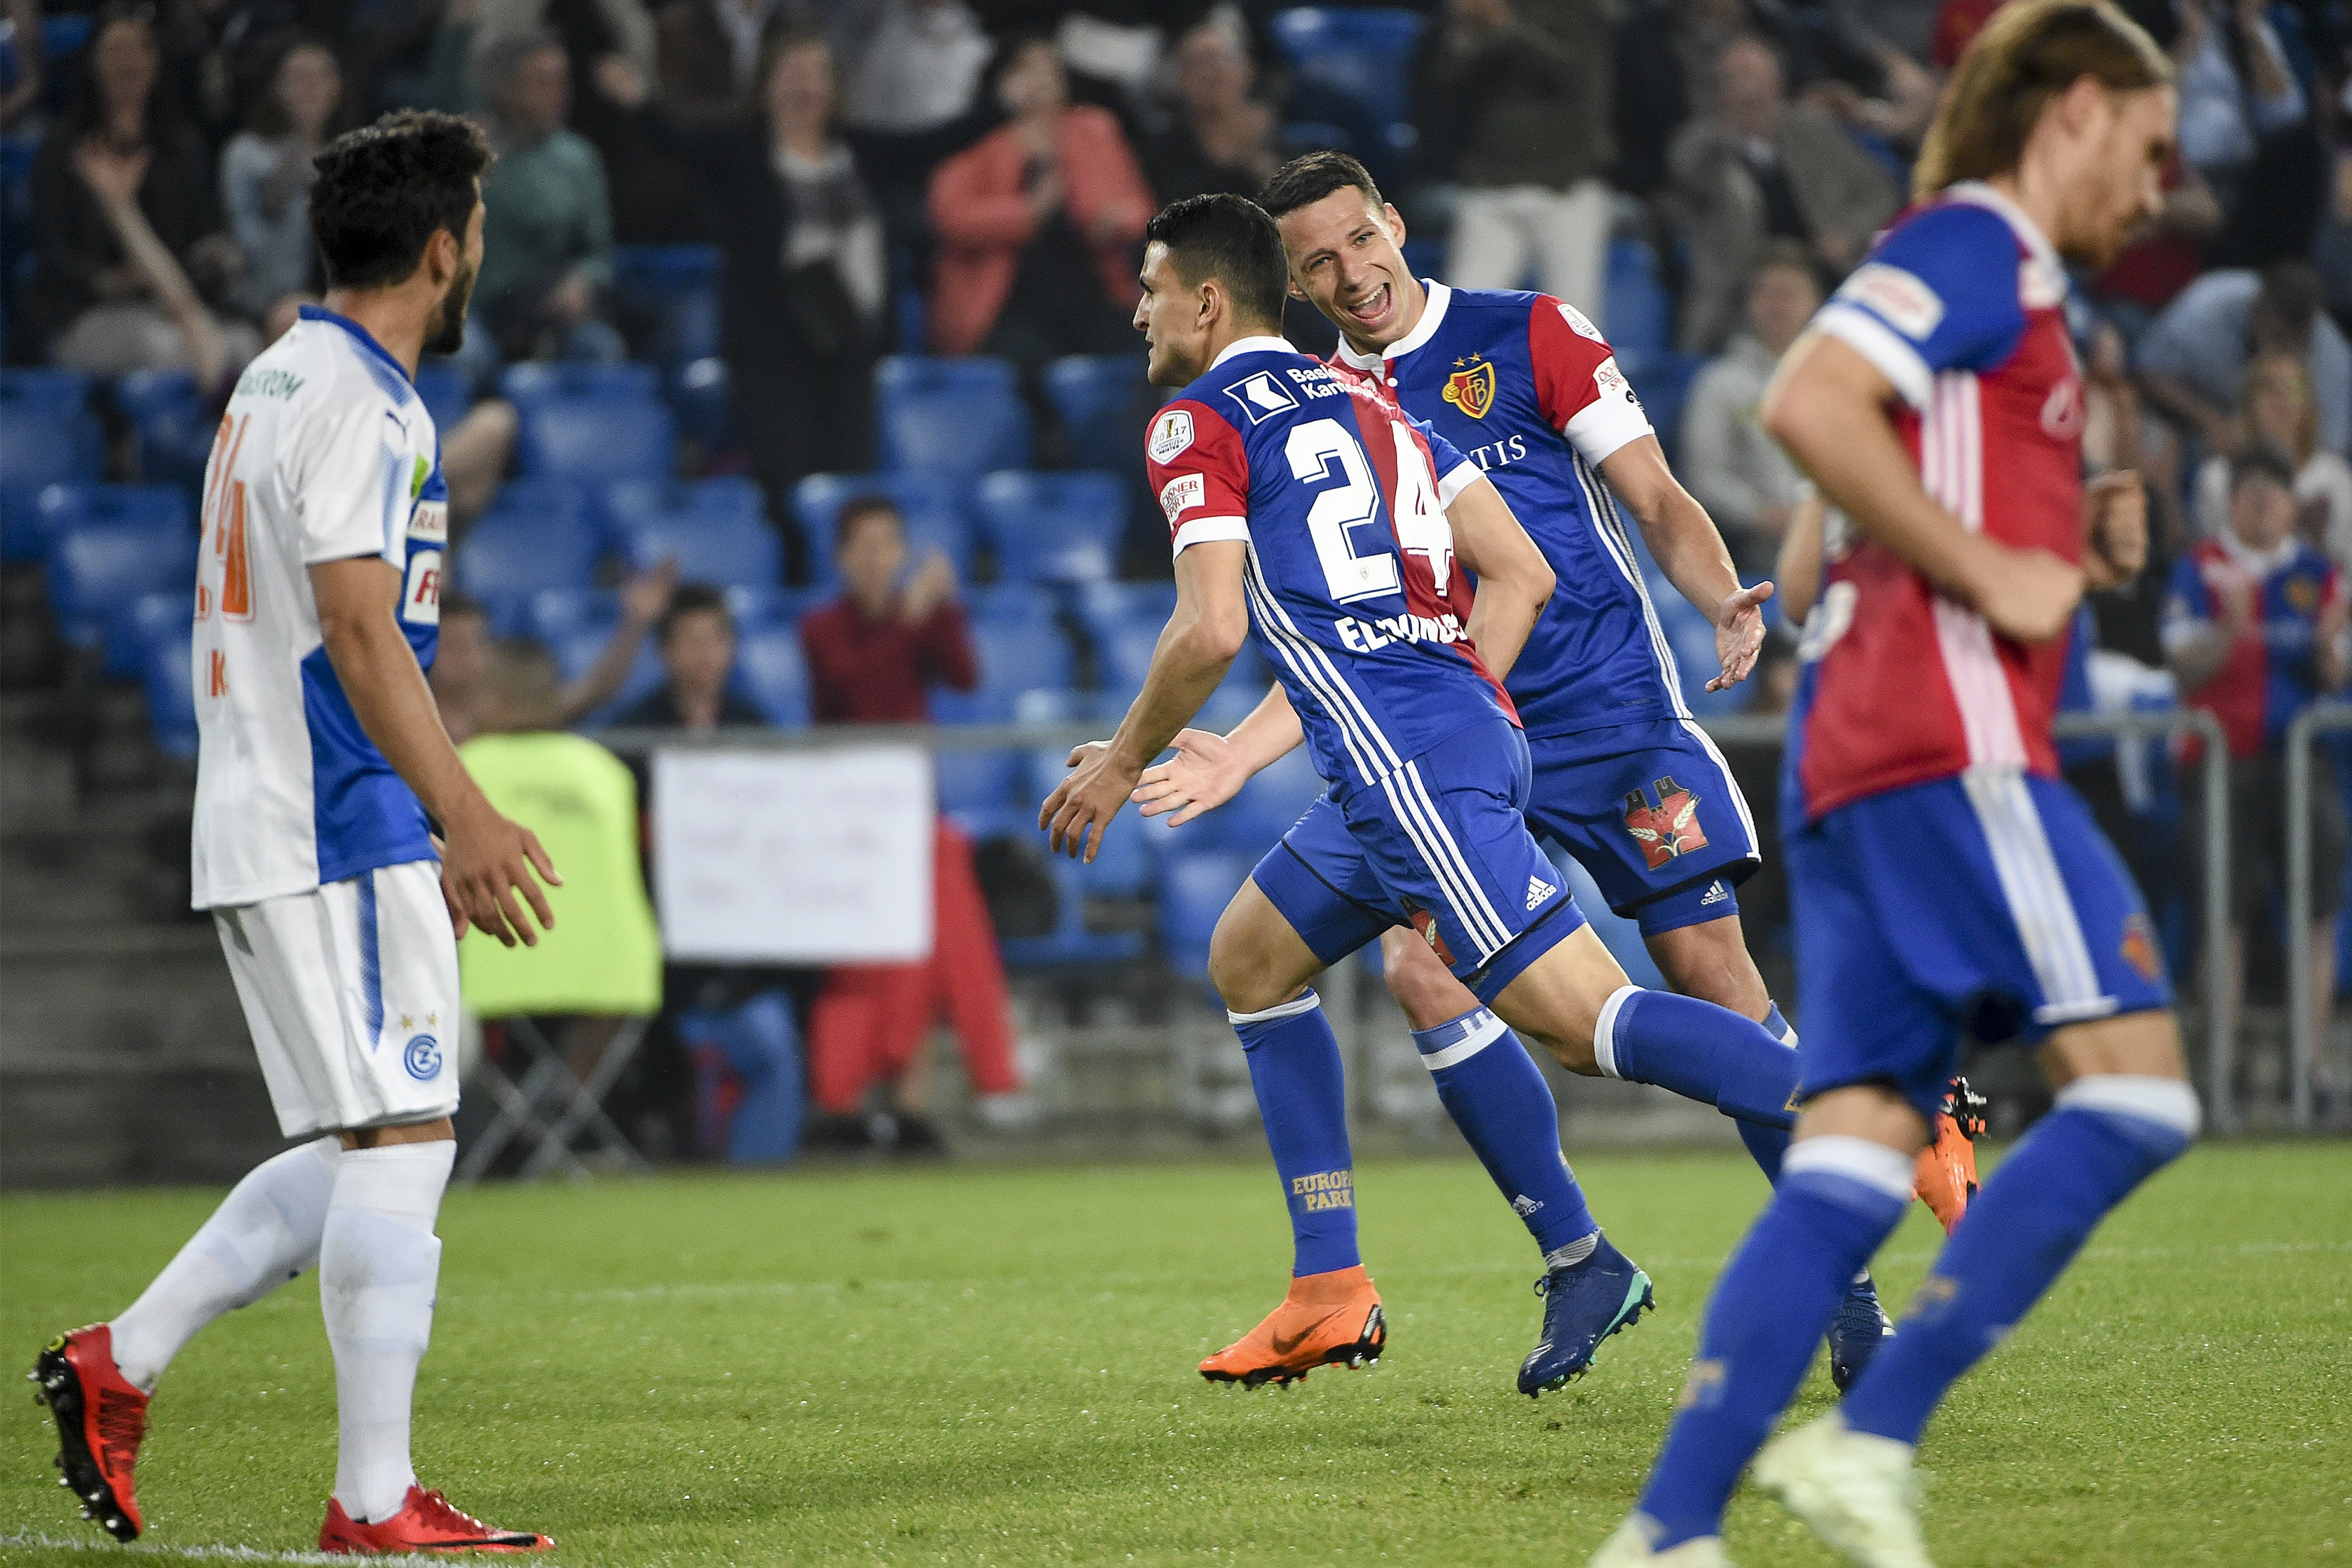 18.04.2018; Basel; Fussball Super League - FC Basel - Grasshopper Club Zuerich; Mohamed Elyounoussi (Basel) und Marek Suchy (